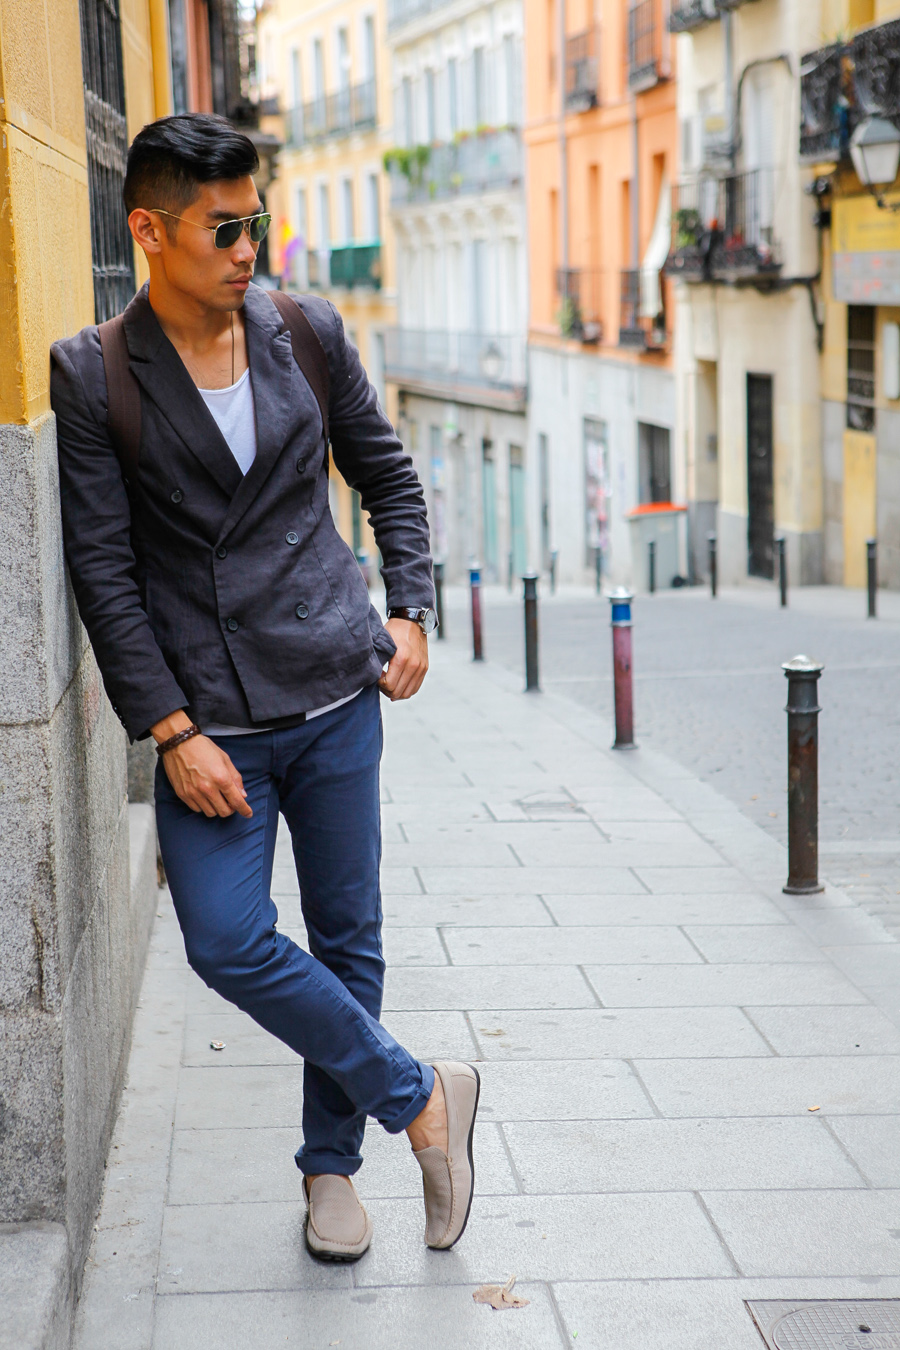 Levitate Style, Levitate Travel, Madrid Spain, Leo Chan, Alicia Mara, double breast blazer, menswear